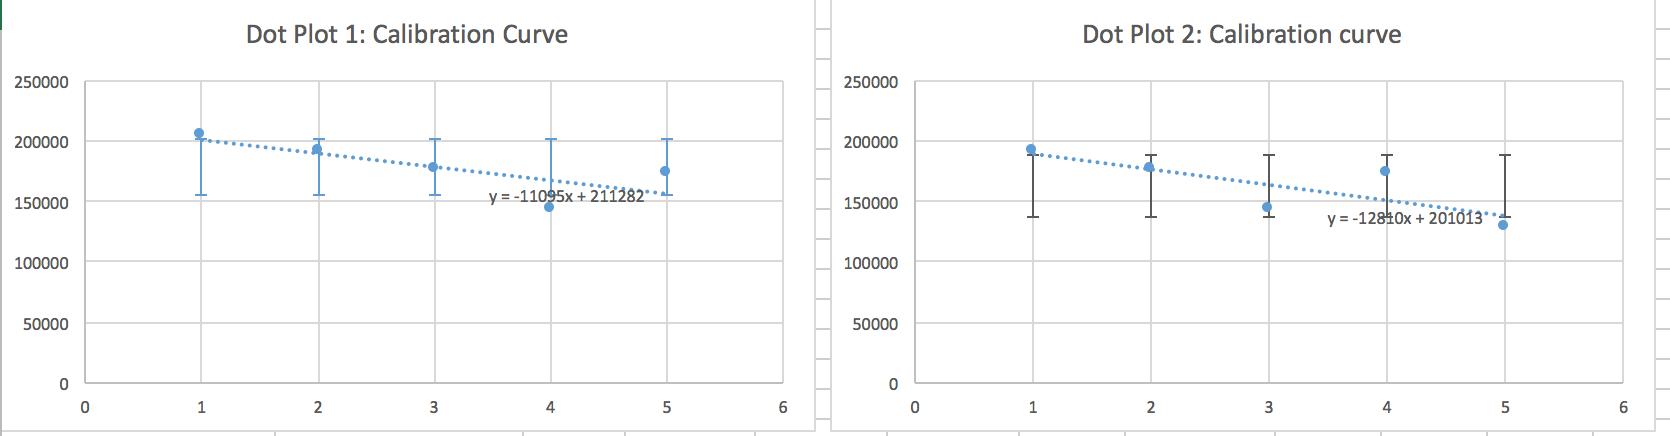 Calibration curves.jpg